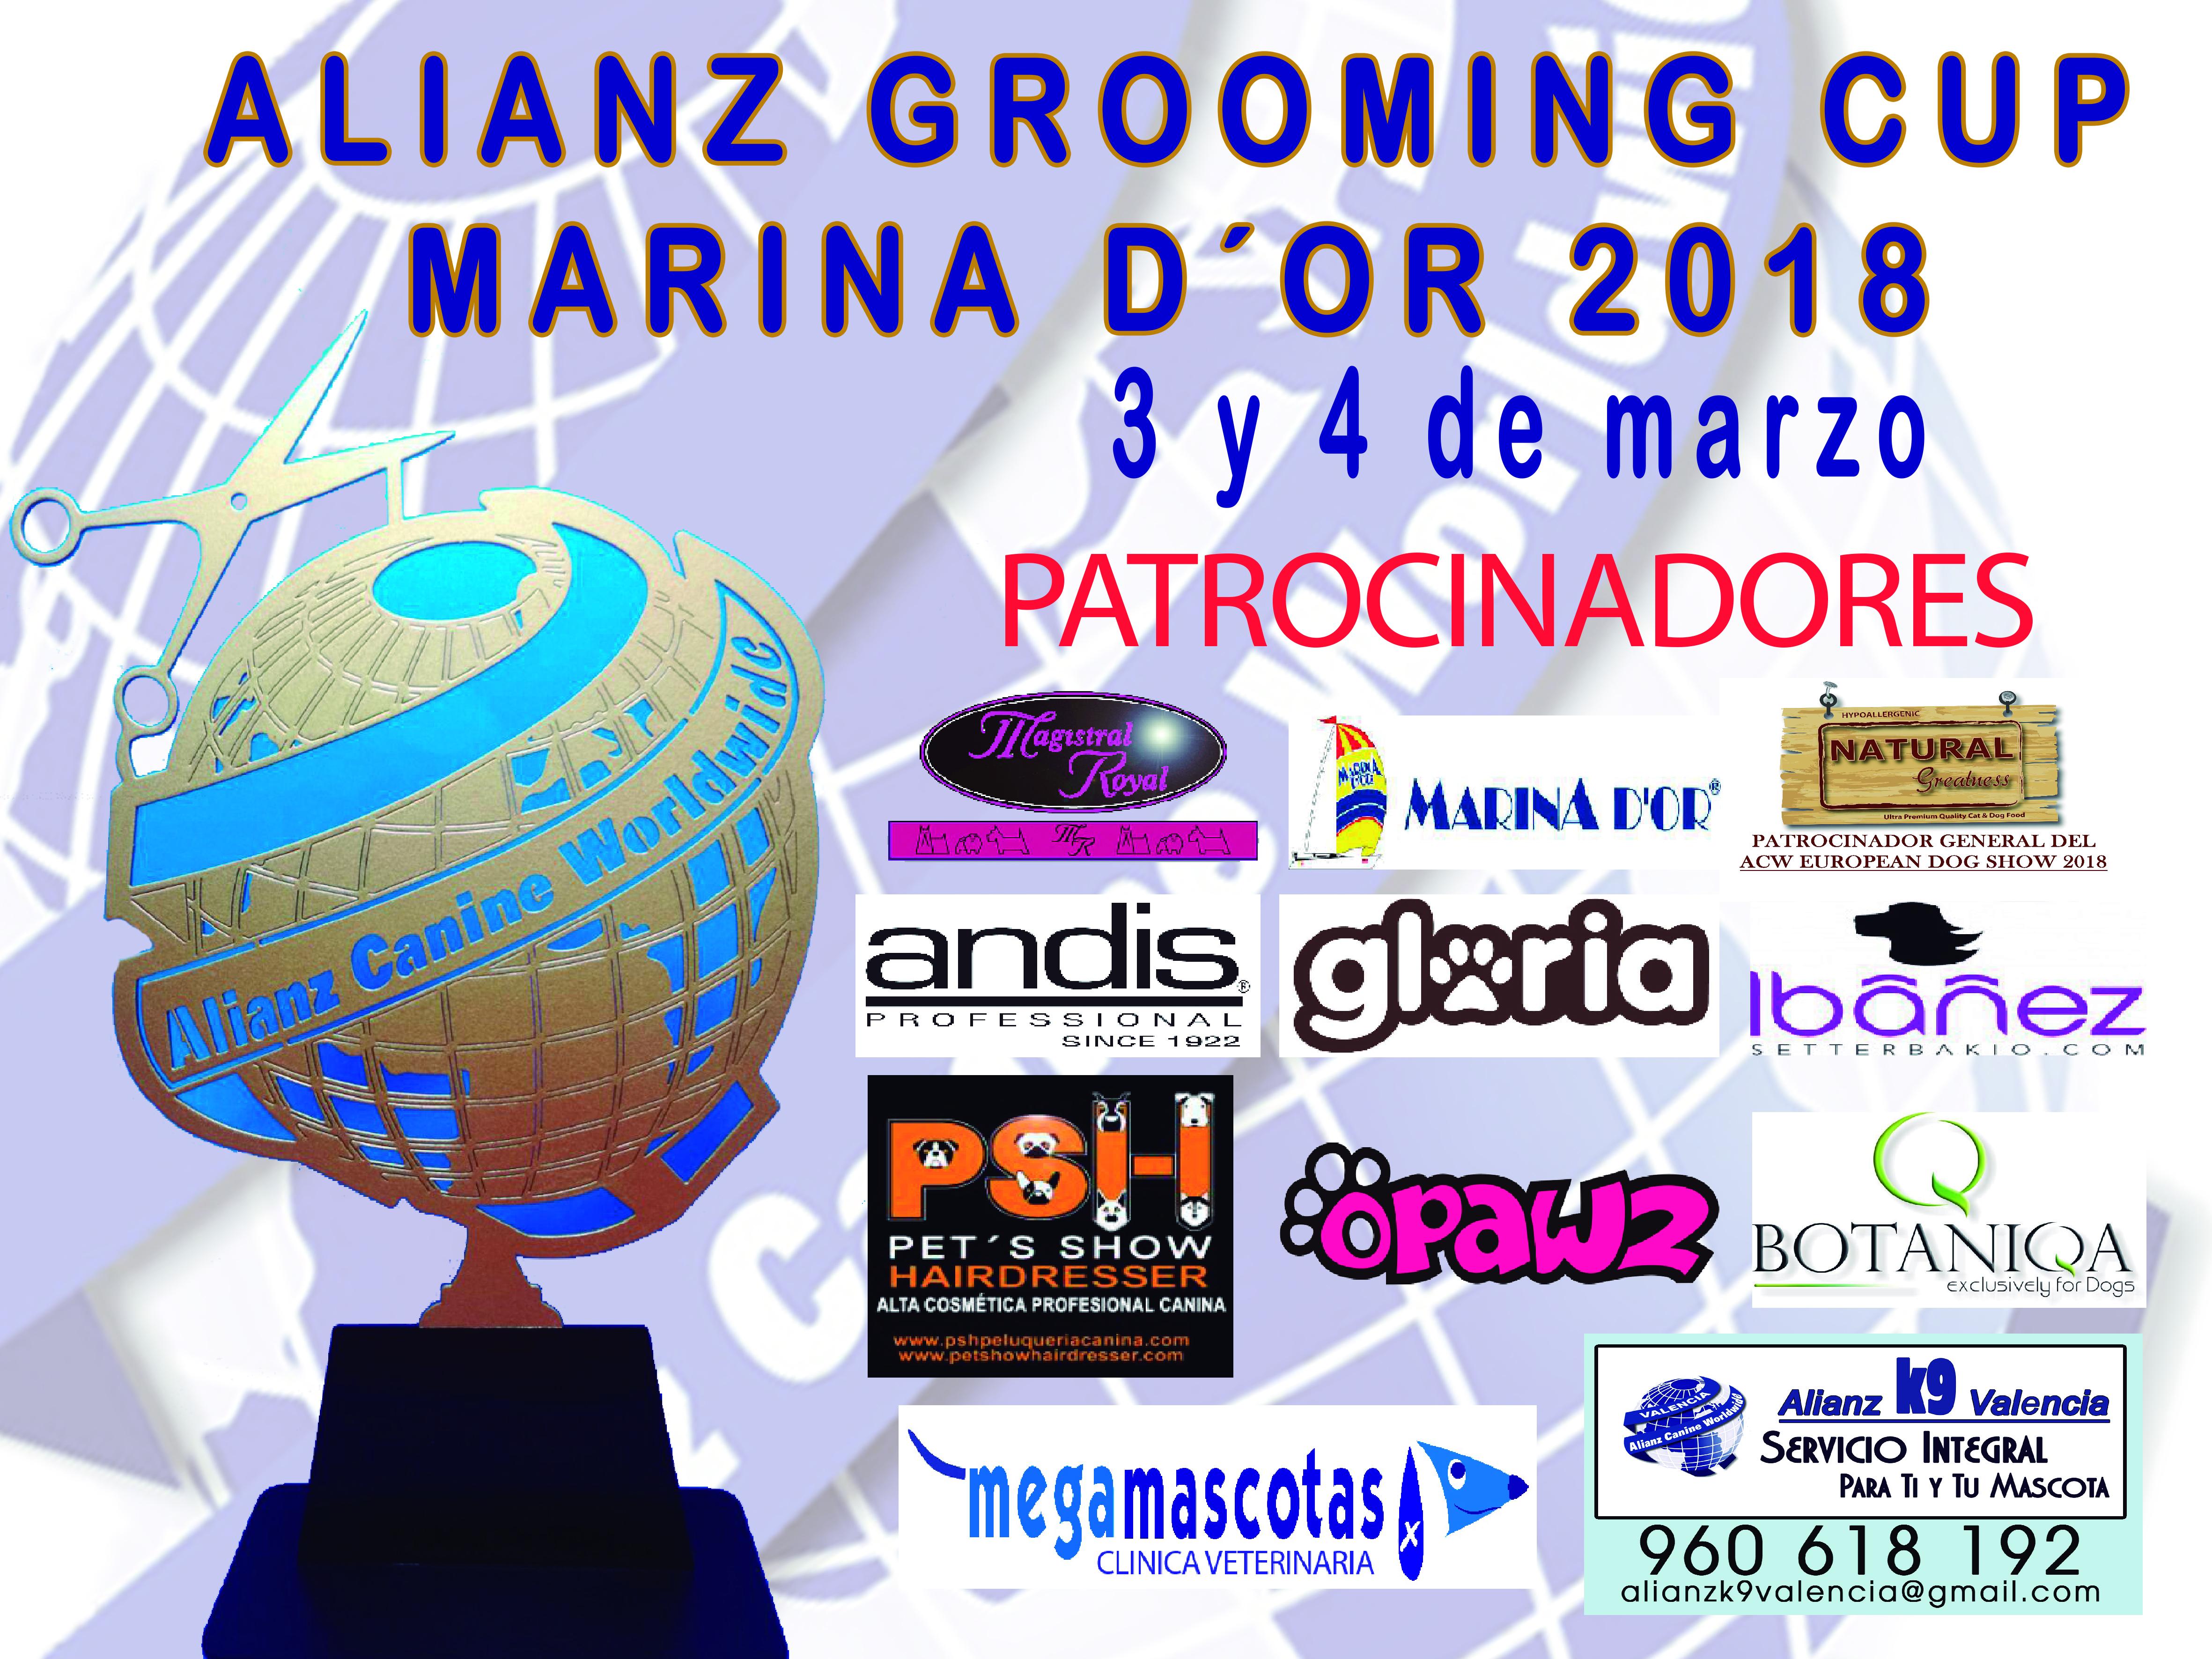 patrocinadores-marina-dor-2018